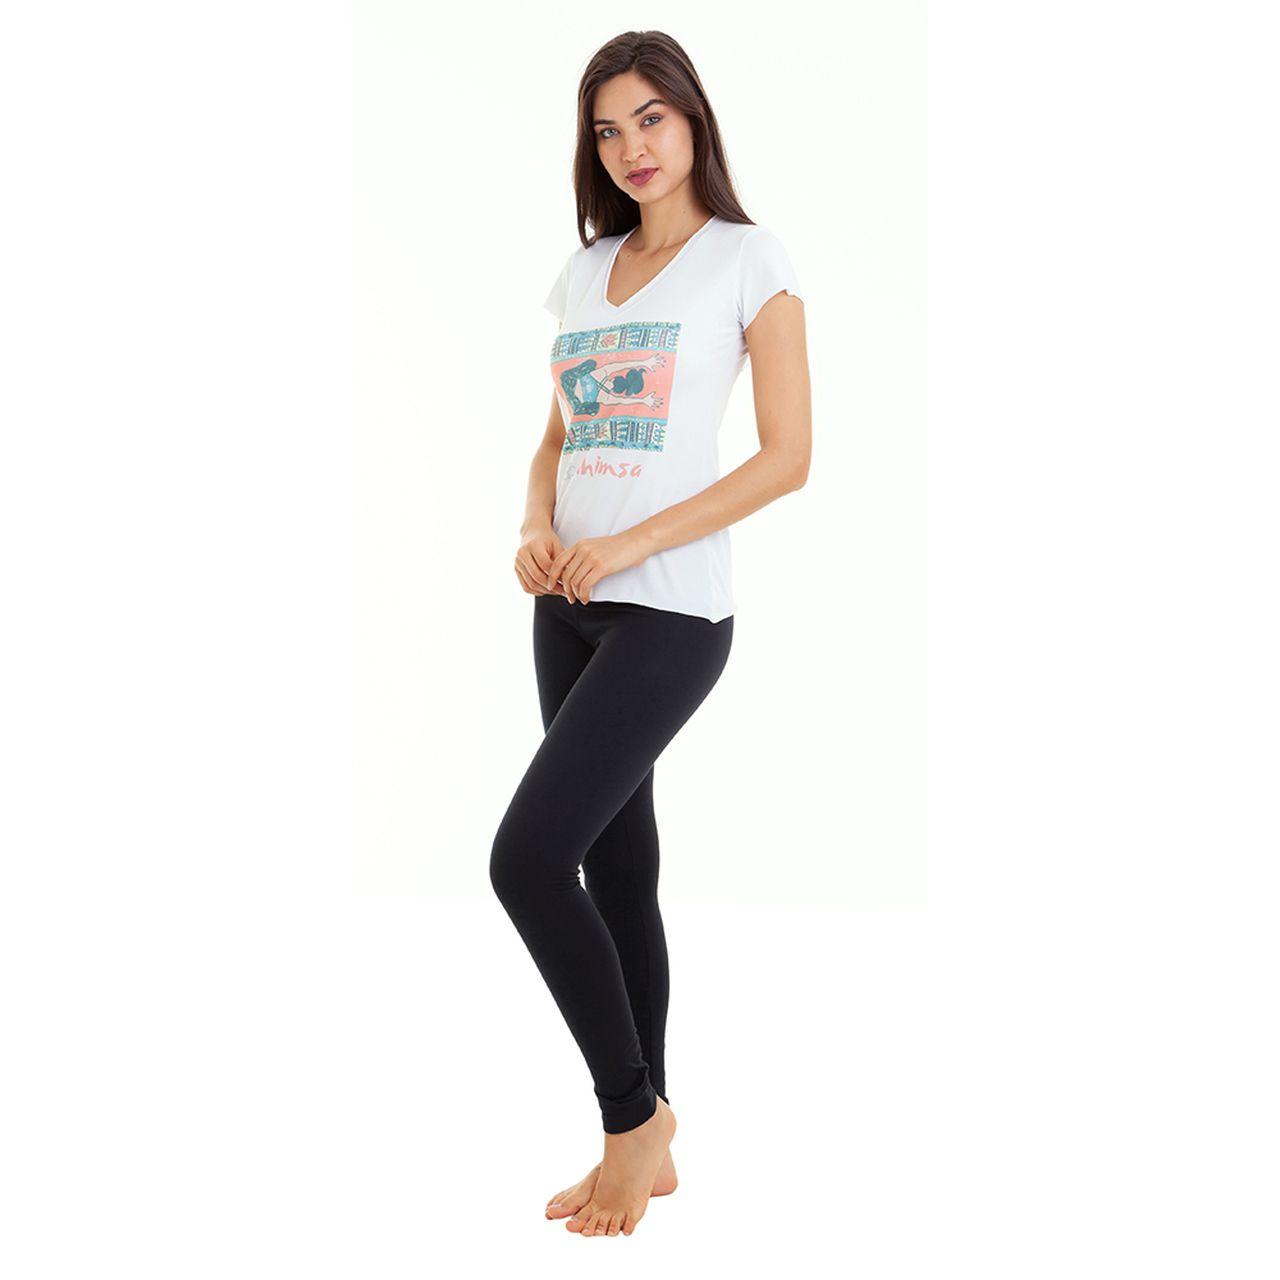 Baby Look - Branca - Ahimsa